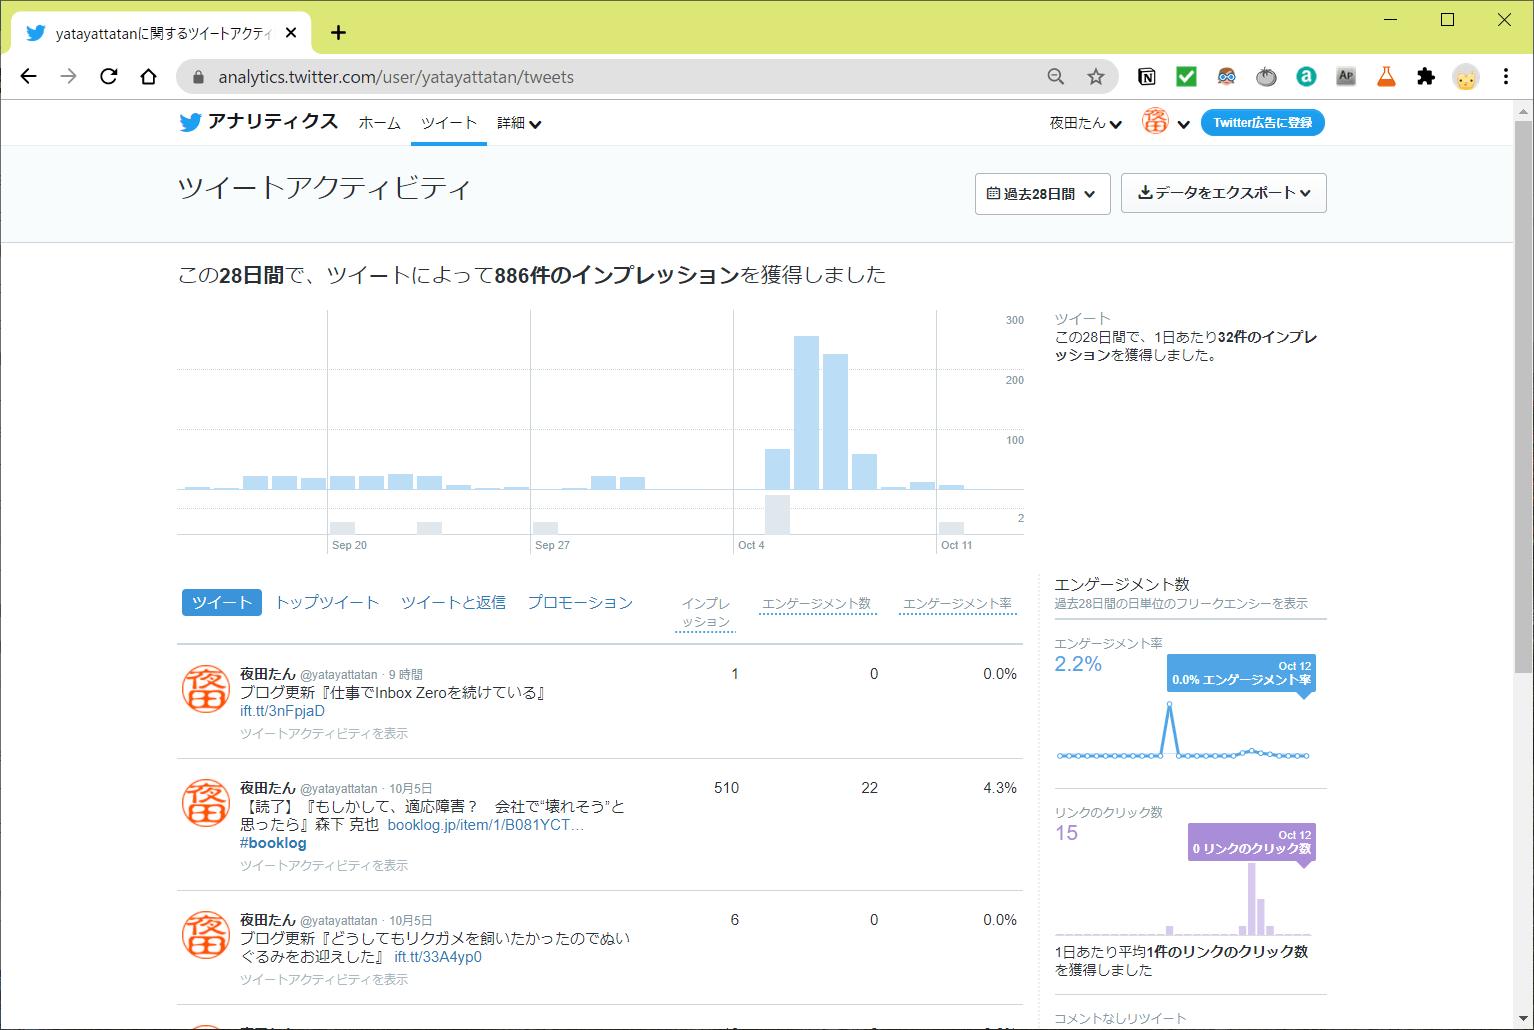 capture of Twitter analytics